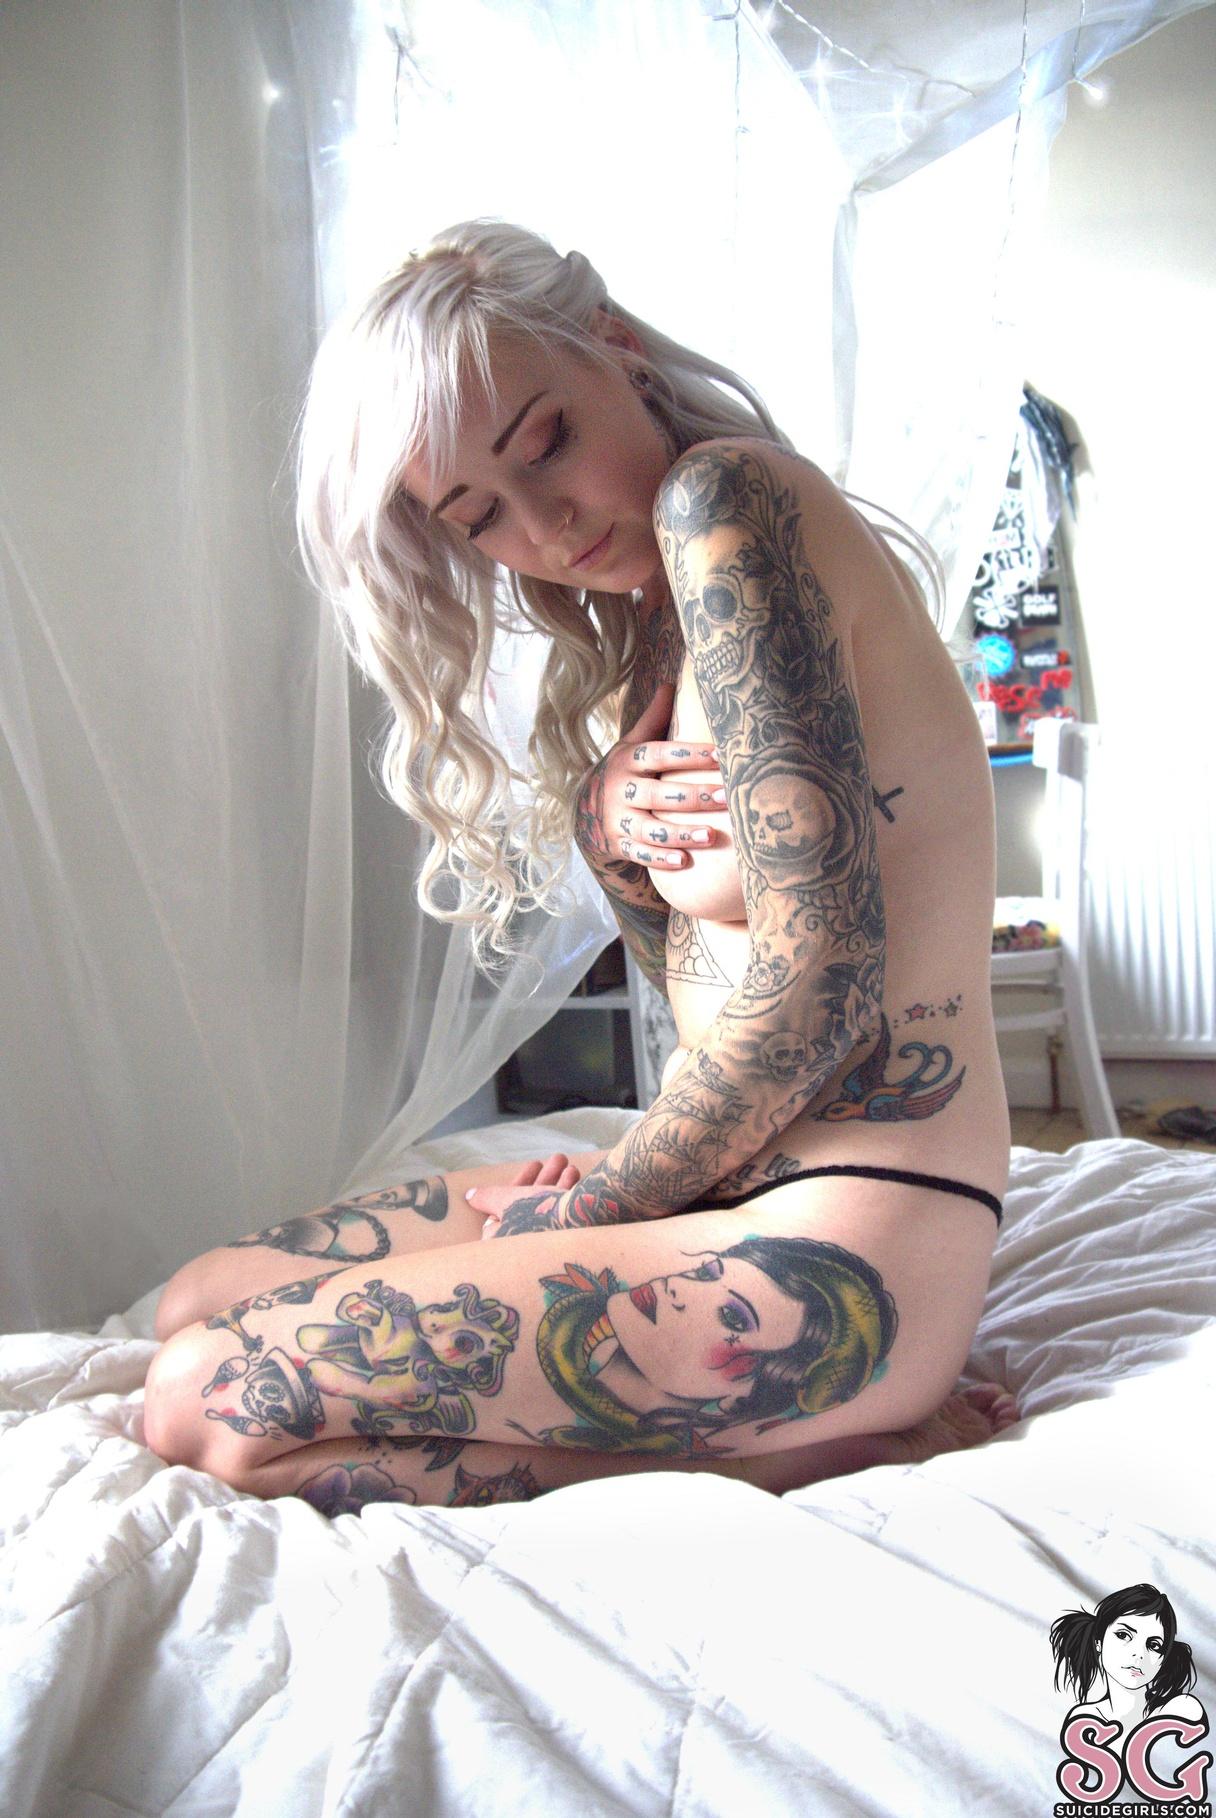 Rosemo Suicide Girl photo 24